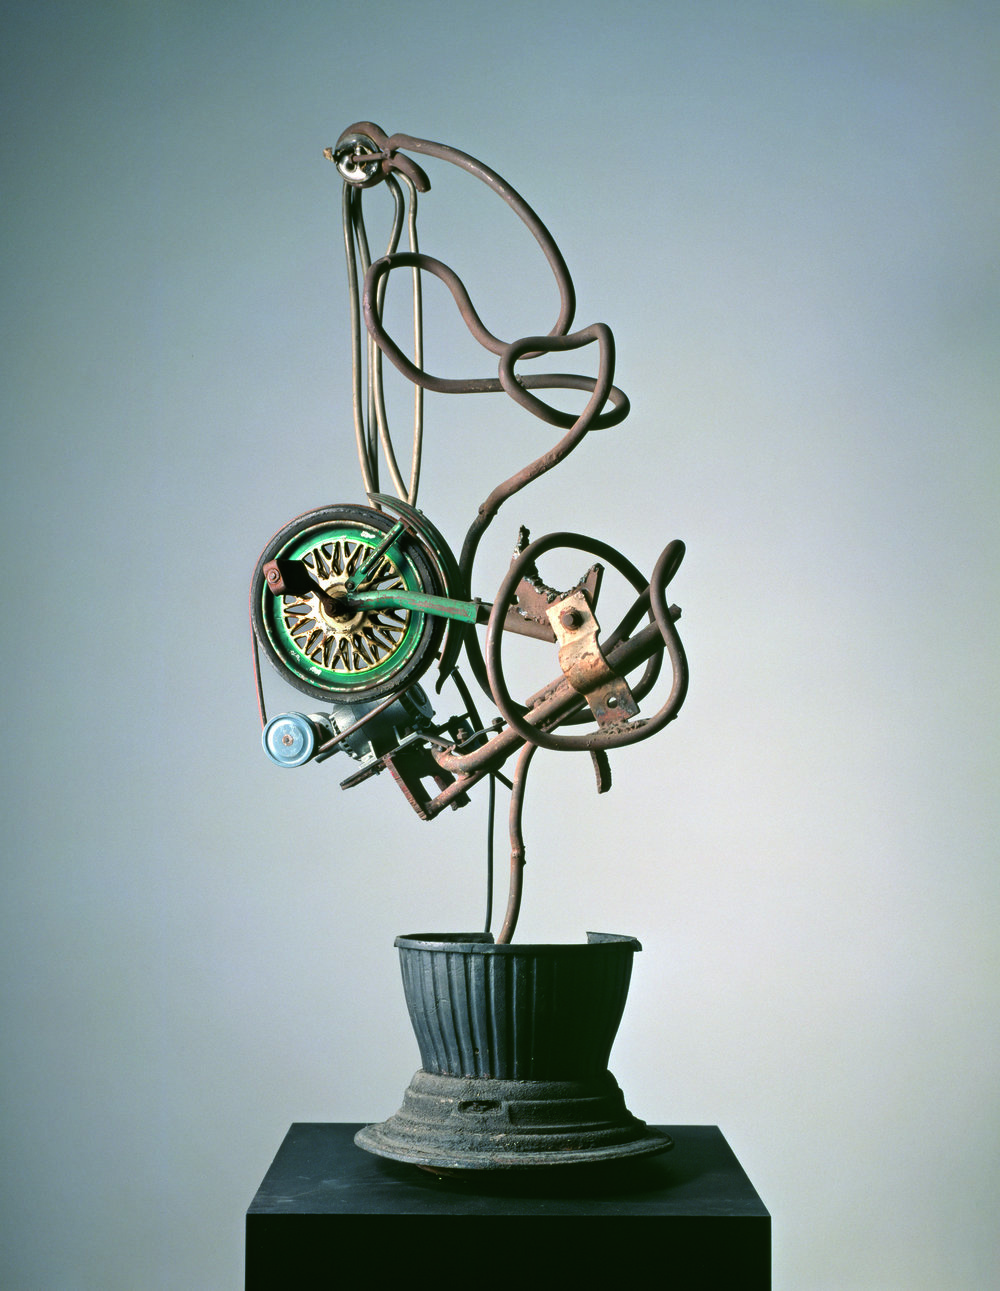 Jean_Tinguely_Suzuki_(Hiroshima)_1963_Museum_Tinguely.jpg